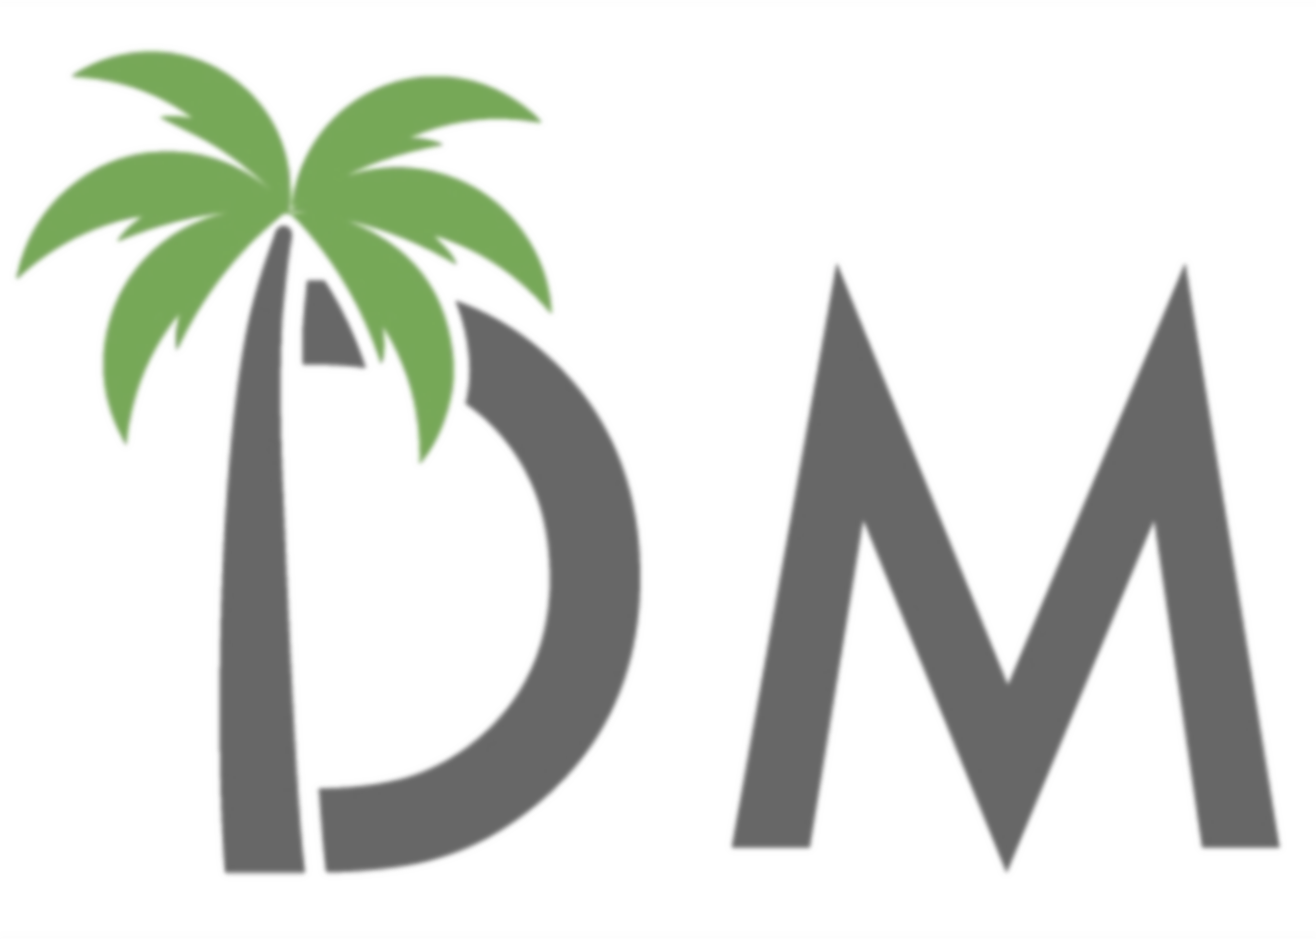 Dickens Media, a chatbot developer